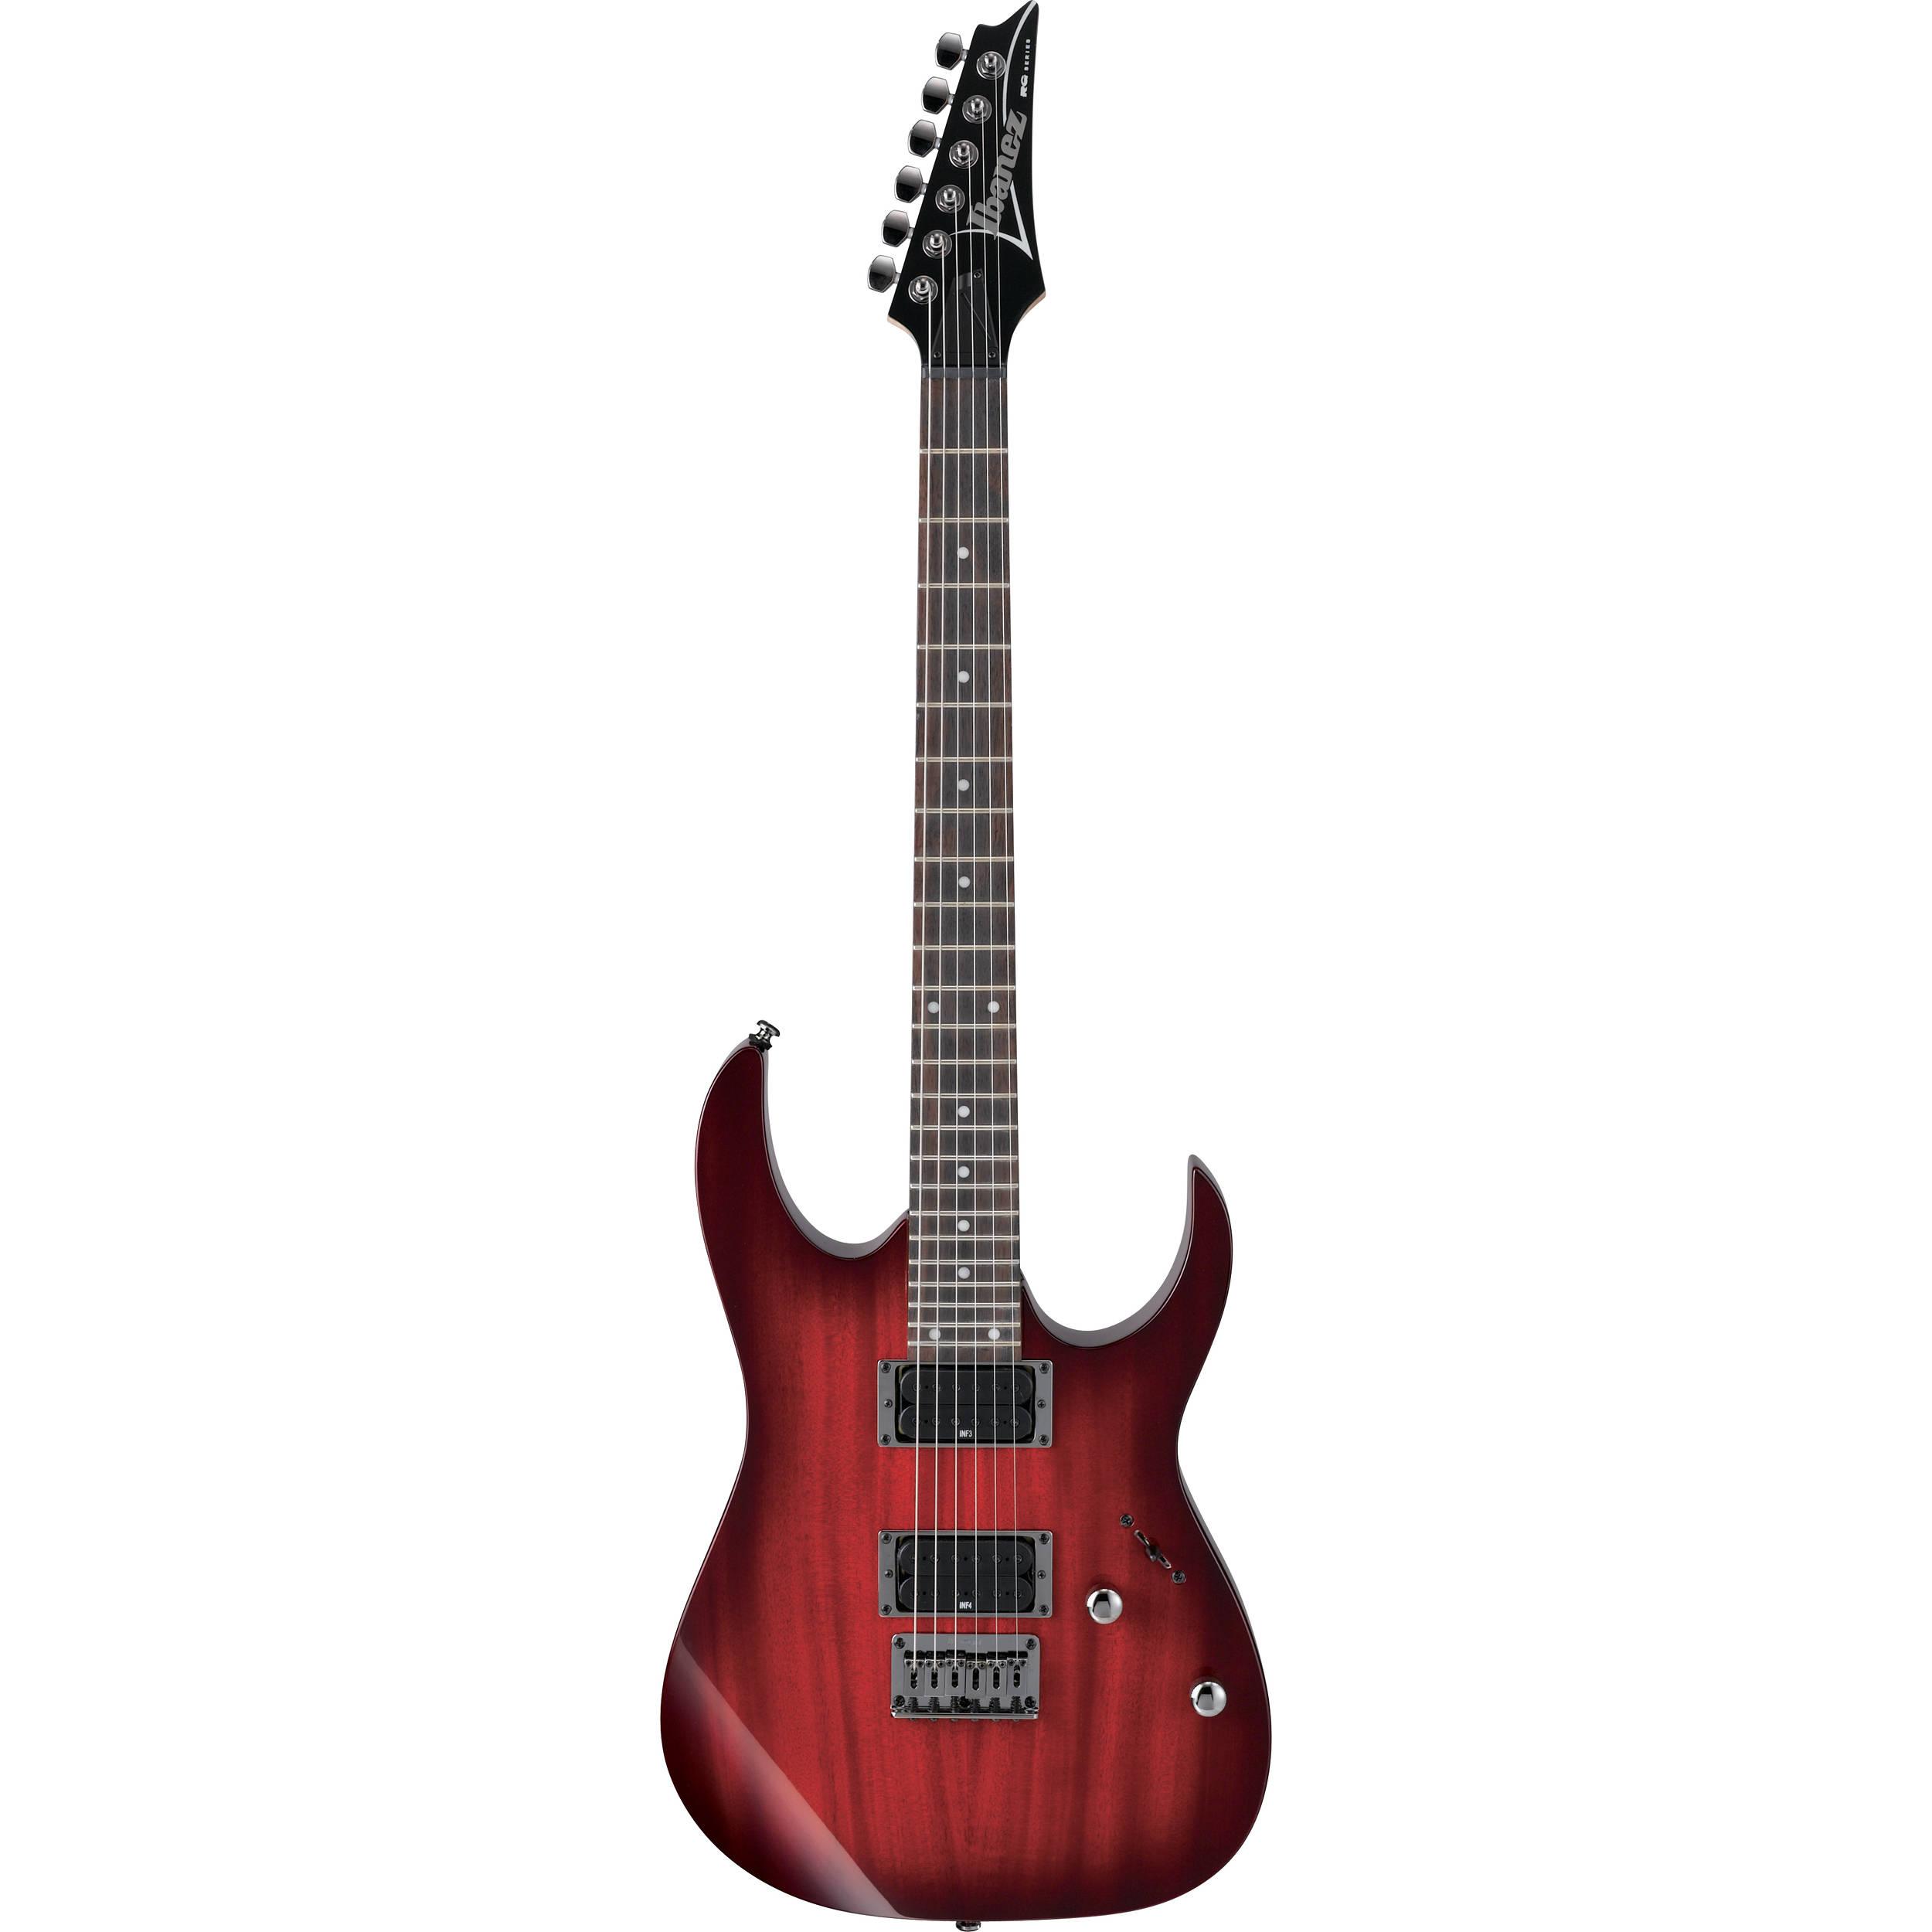 Ibanez Rg421 Electric Guitar Blackberry Sunburst